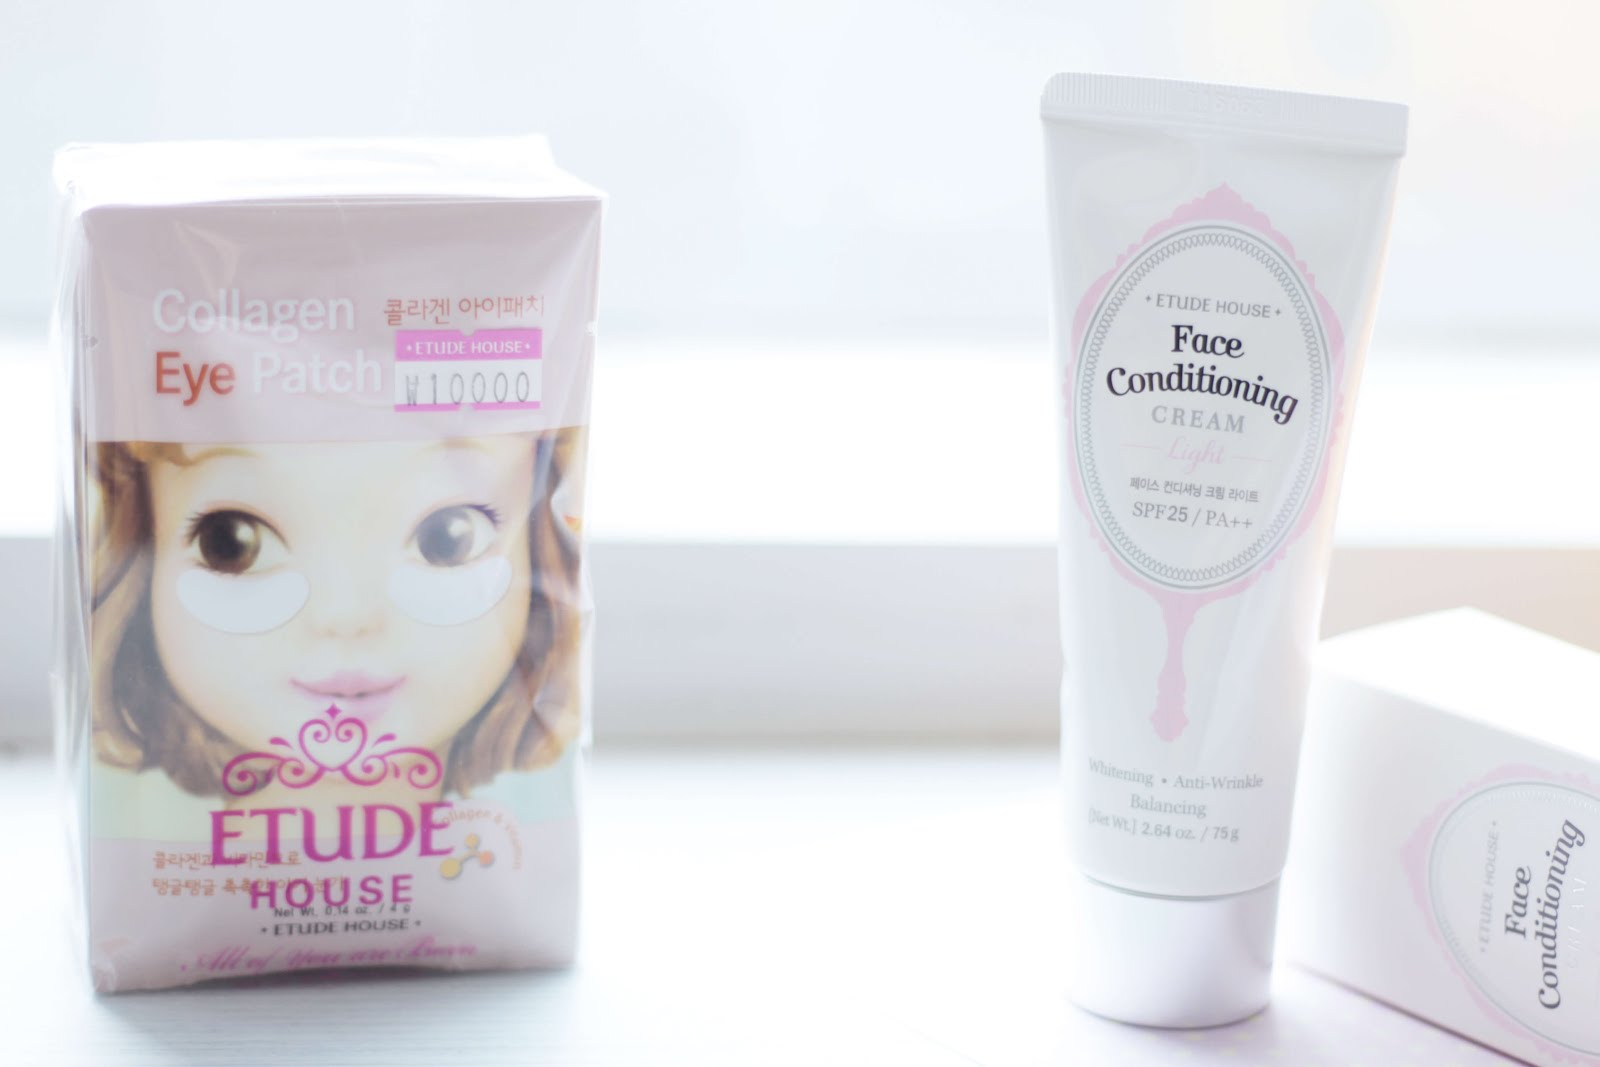 korean beauty haul etude house collagen eye patch skin conditioning cream